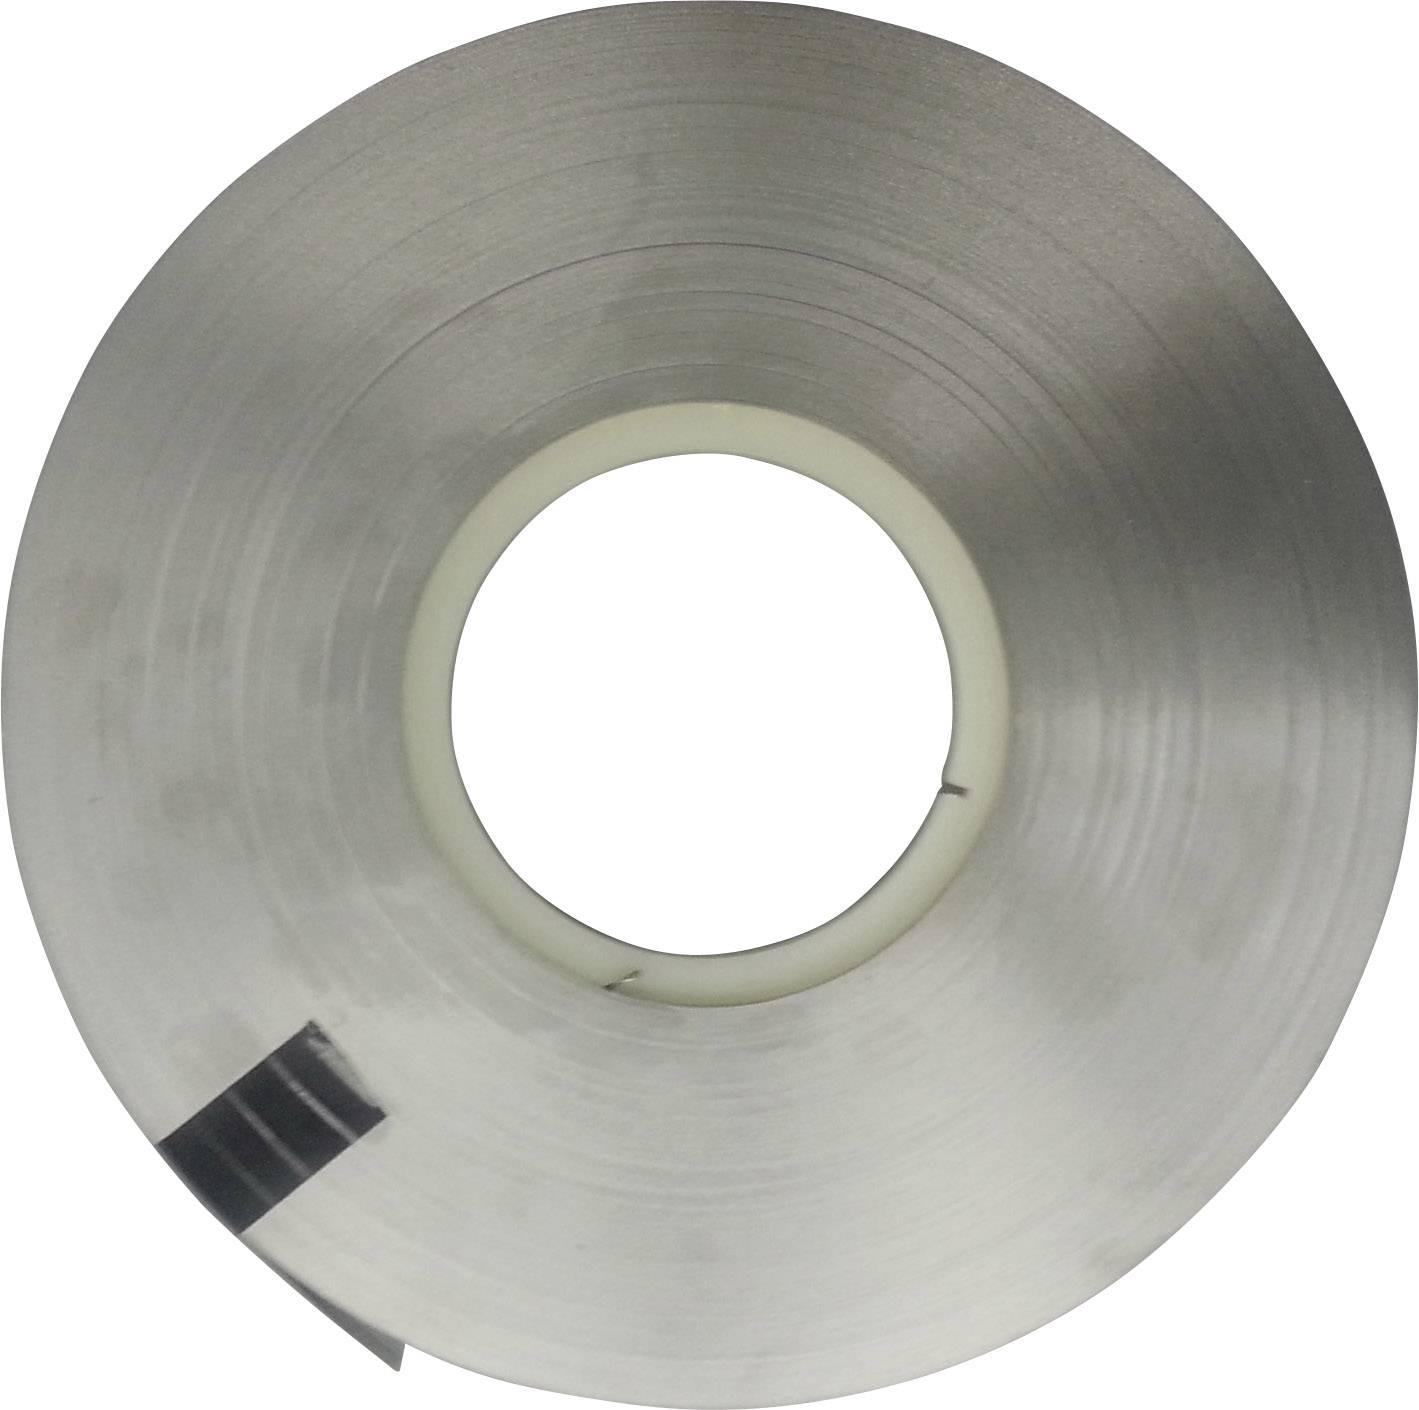 Páska pre aku nikel Hilumin 240 m 900204, (d x š x v) 240 m x 7 mm x 0.15 mm